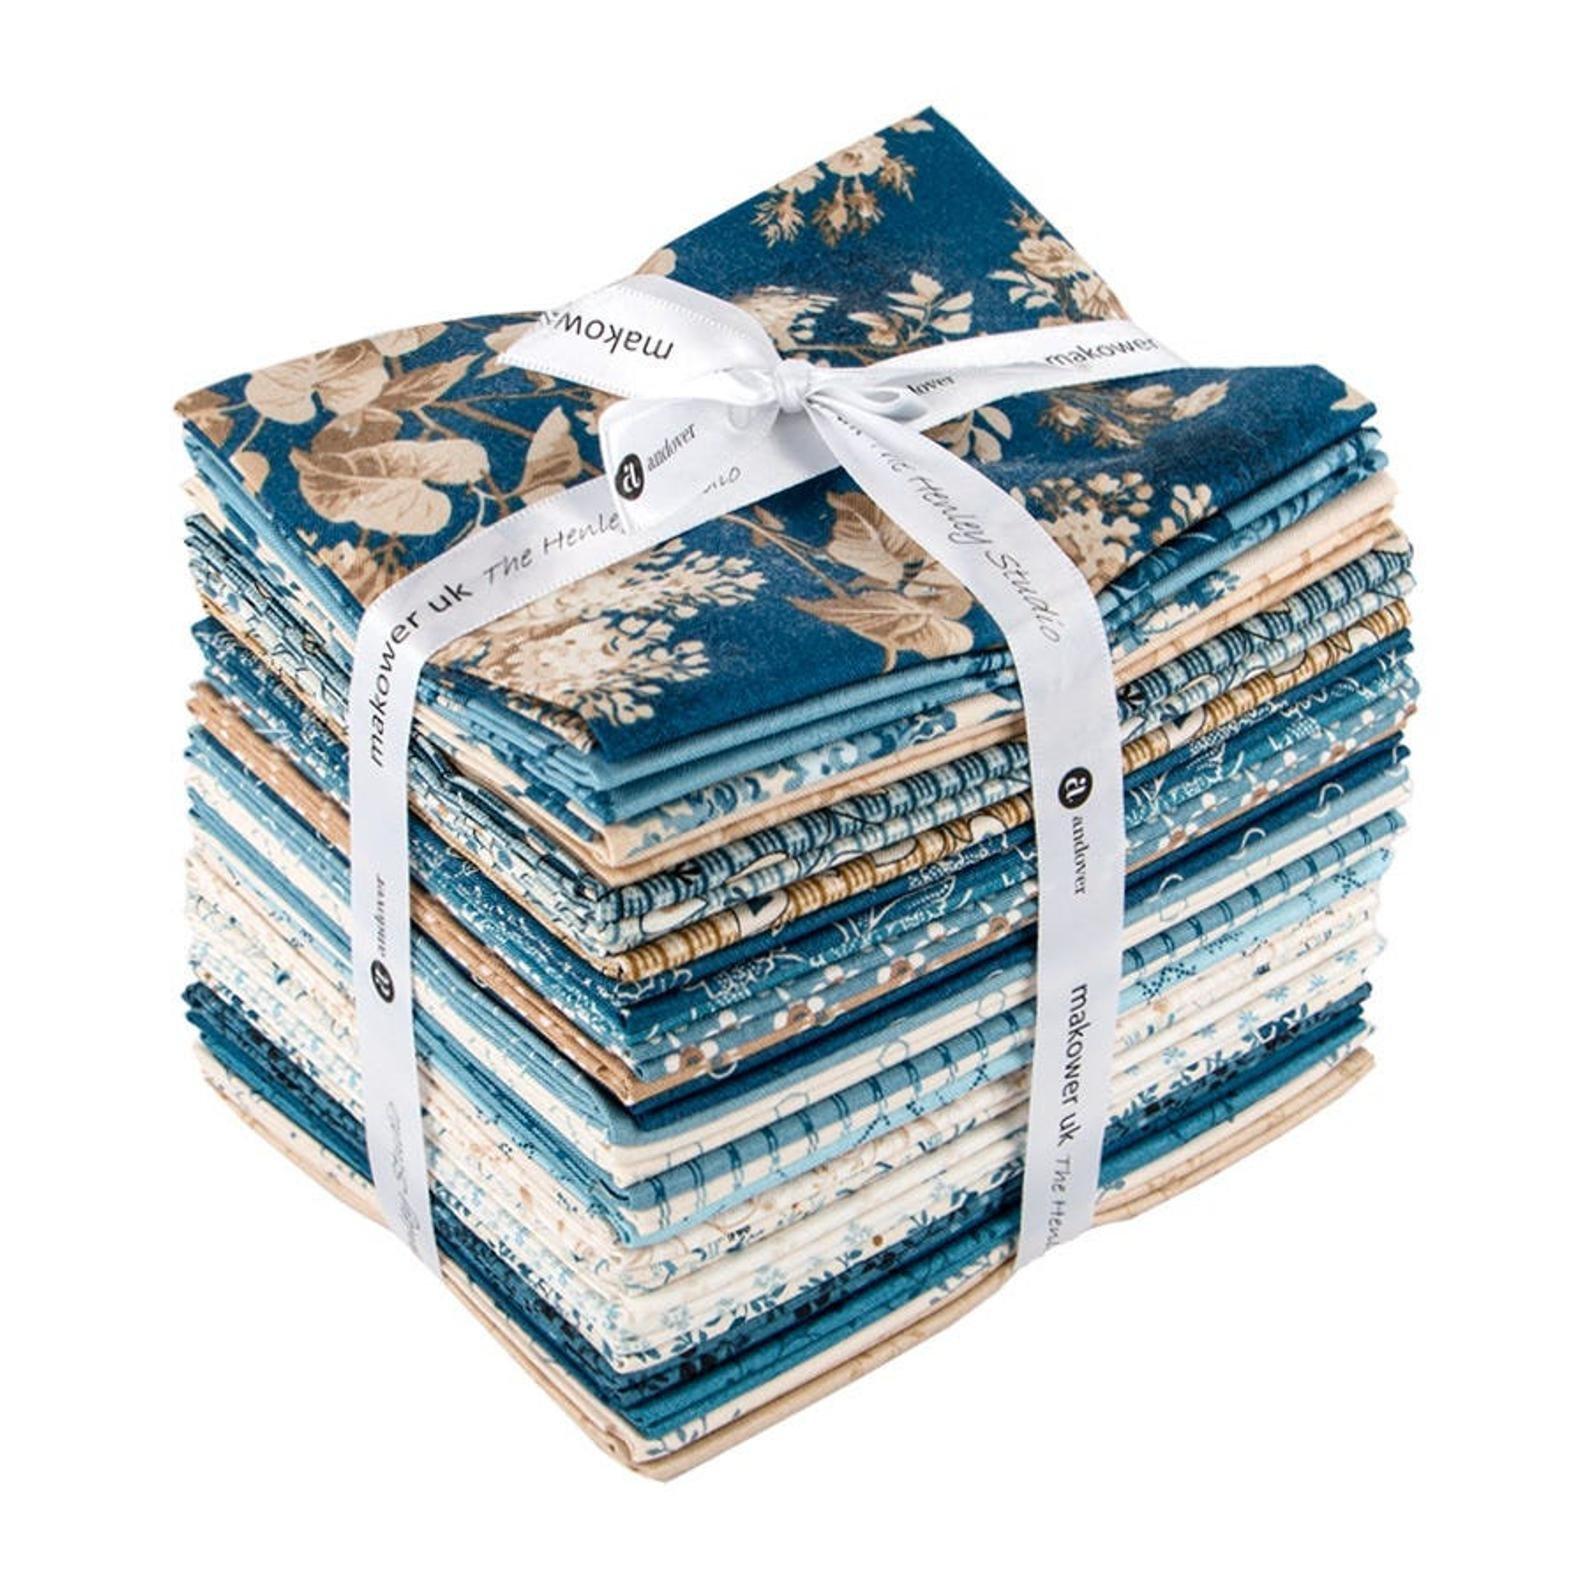 Blue Sky Fat Quarter Bundle by Edyta Sitar for Laundry Basket Quilts